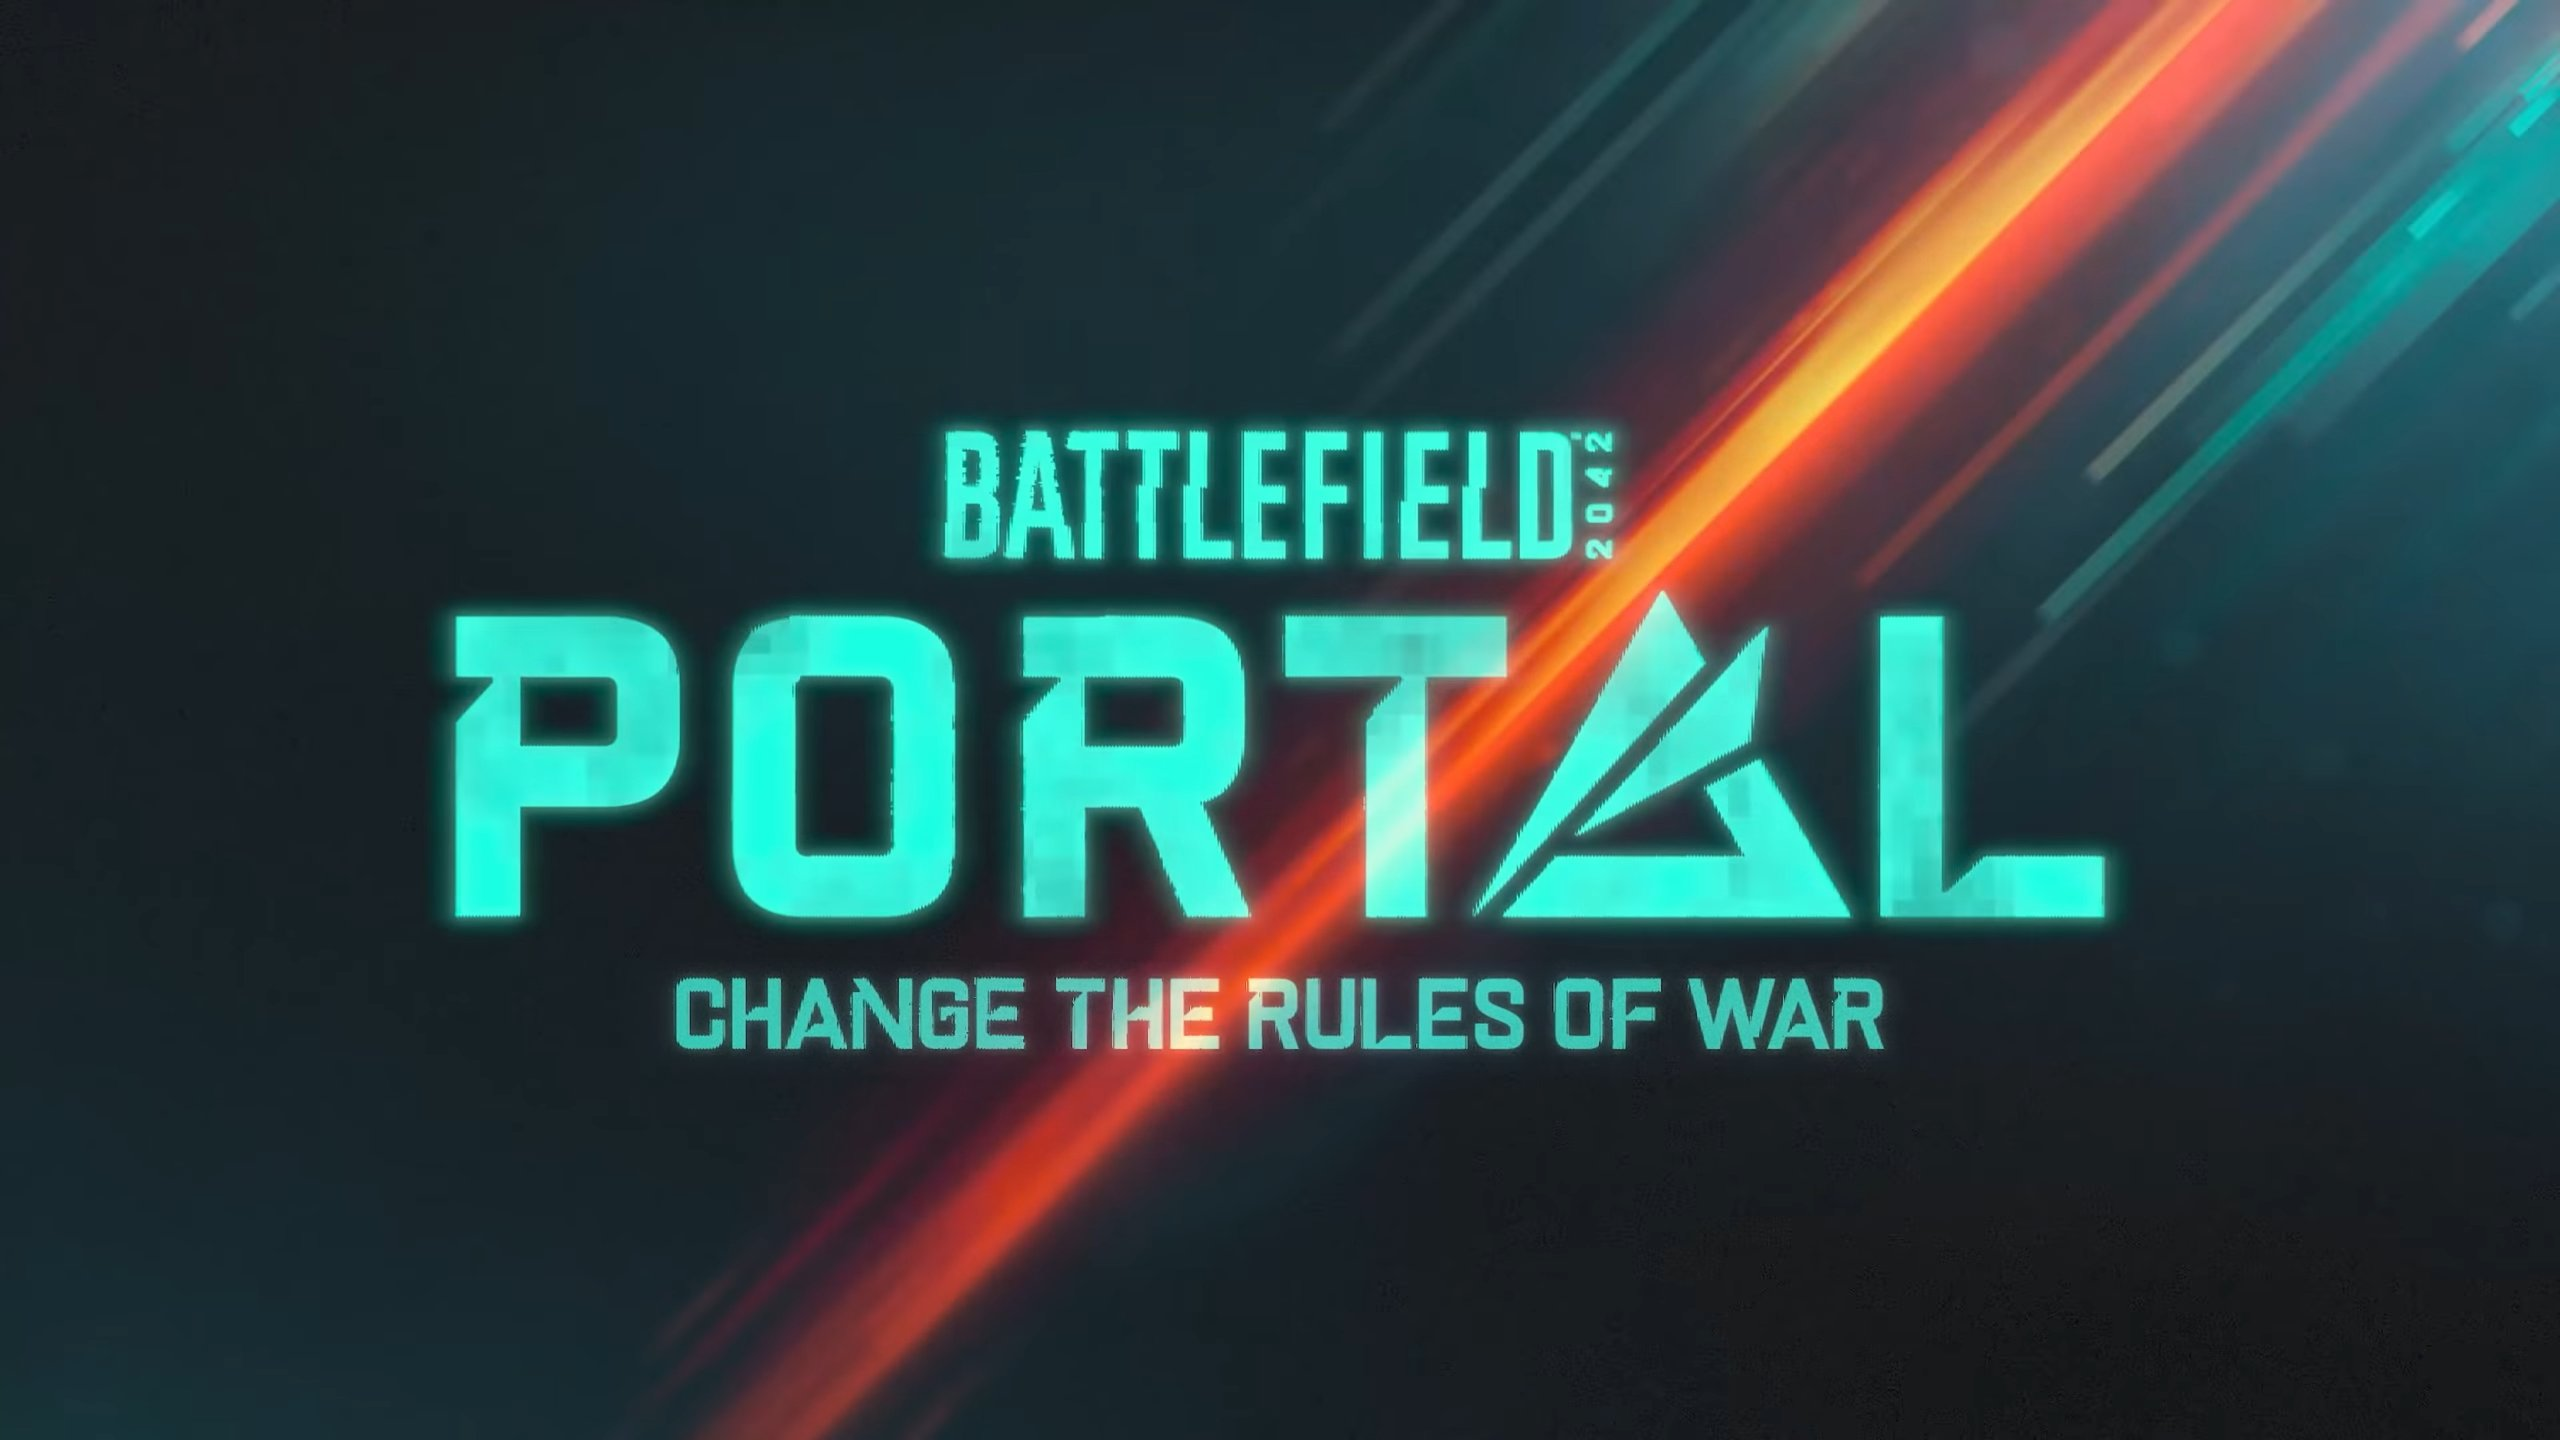 battlefield portalnbsp